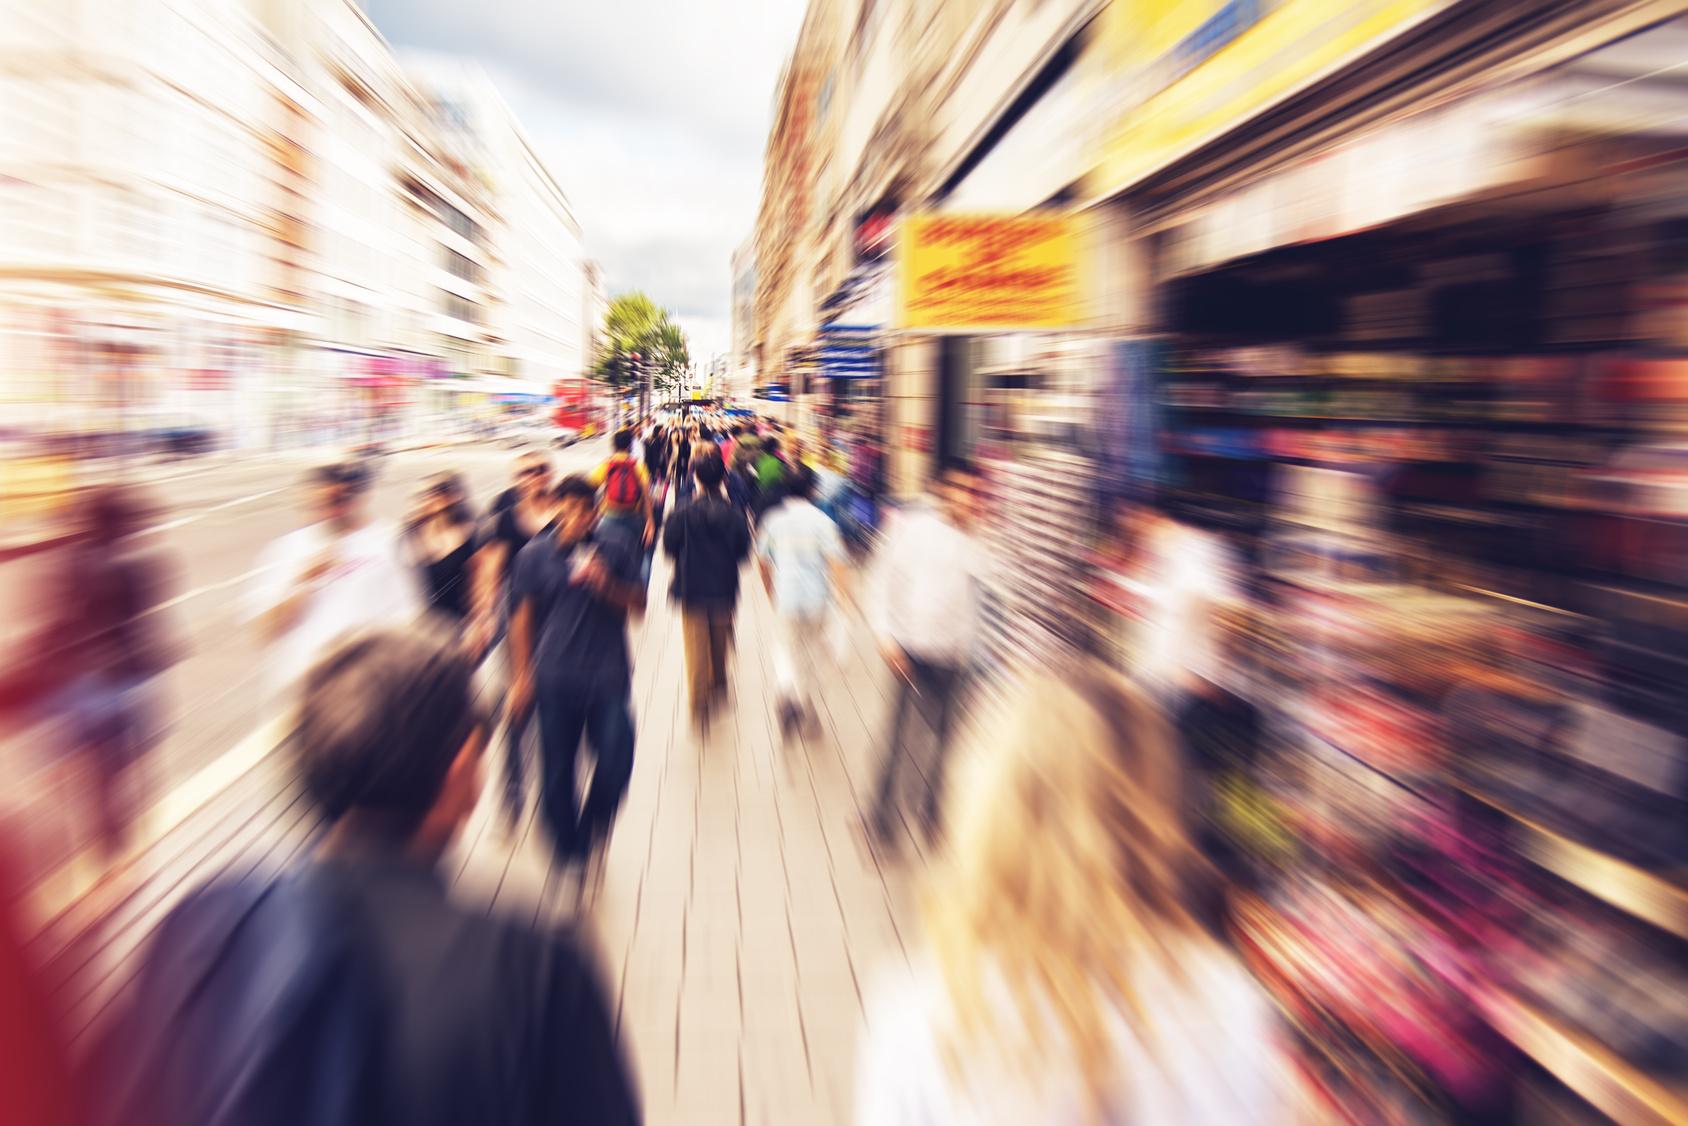 People shopping and walking in London Oxford street - radial zoom effect defocusing filter applied, with vintage instagram look